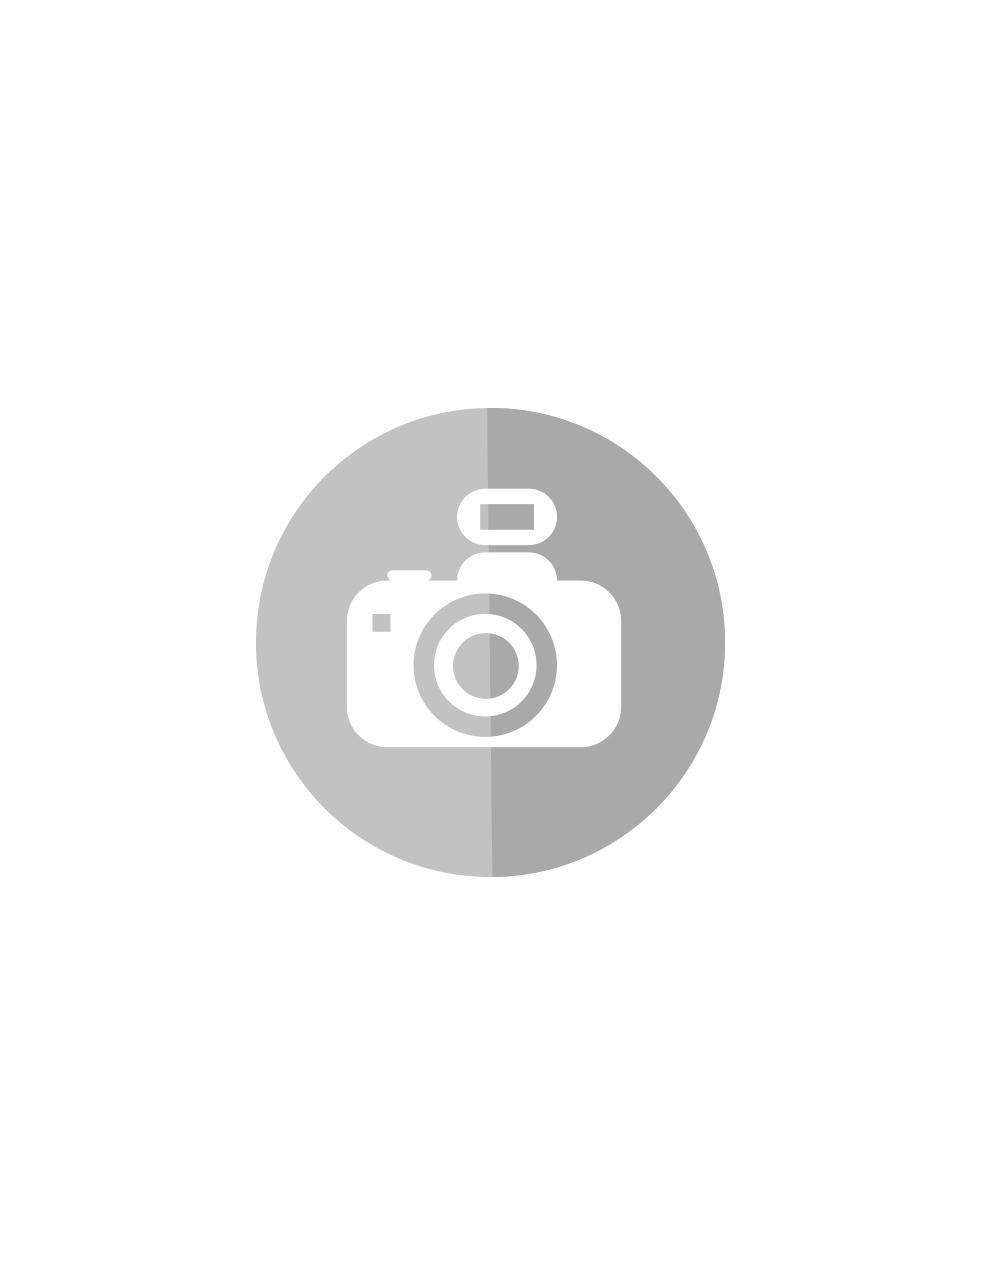 30047862_sparepart/Bodenplatte 8-Eck-Shop